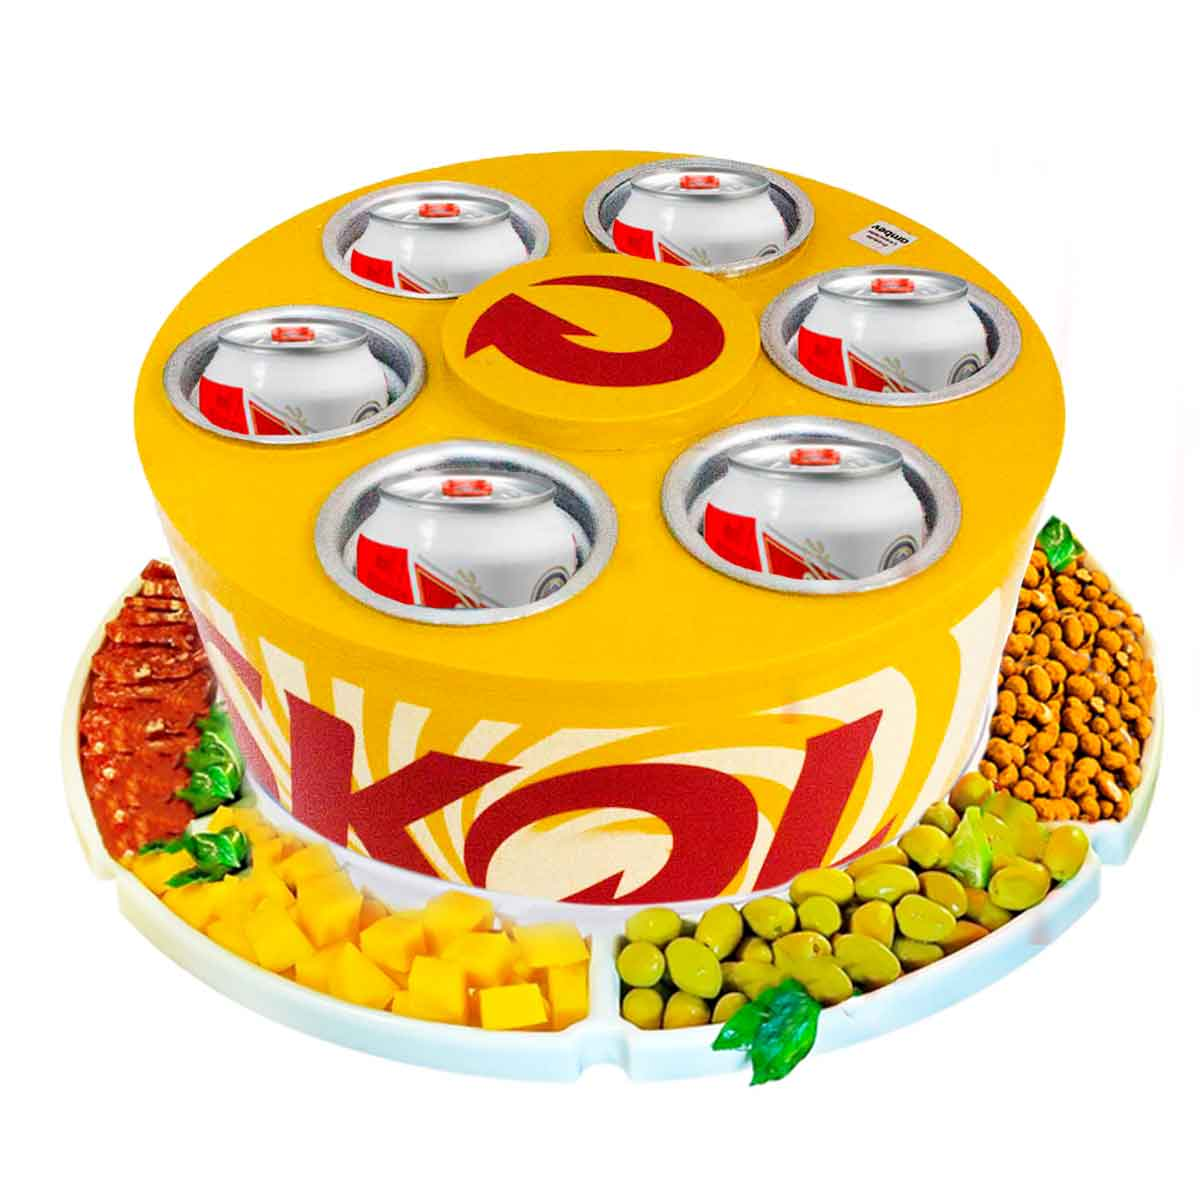 KIT Cooler 3G Skol 6 Latas Cerveja + Petisqueira Giratória